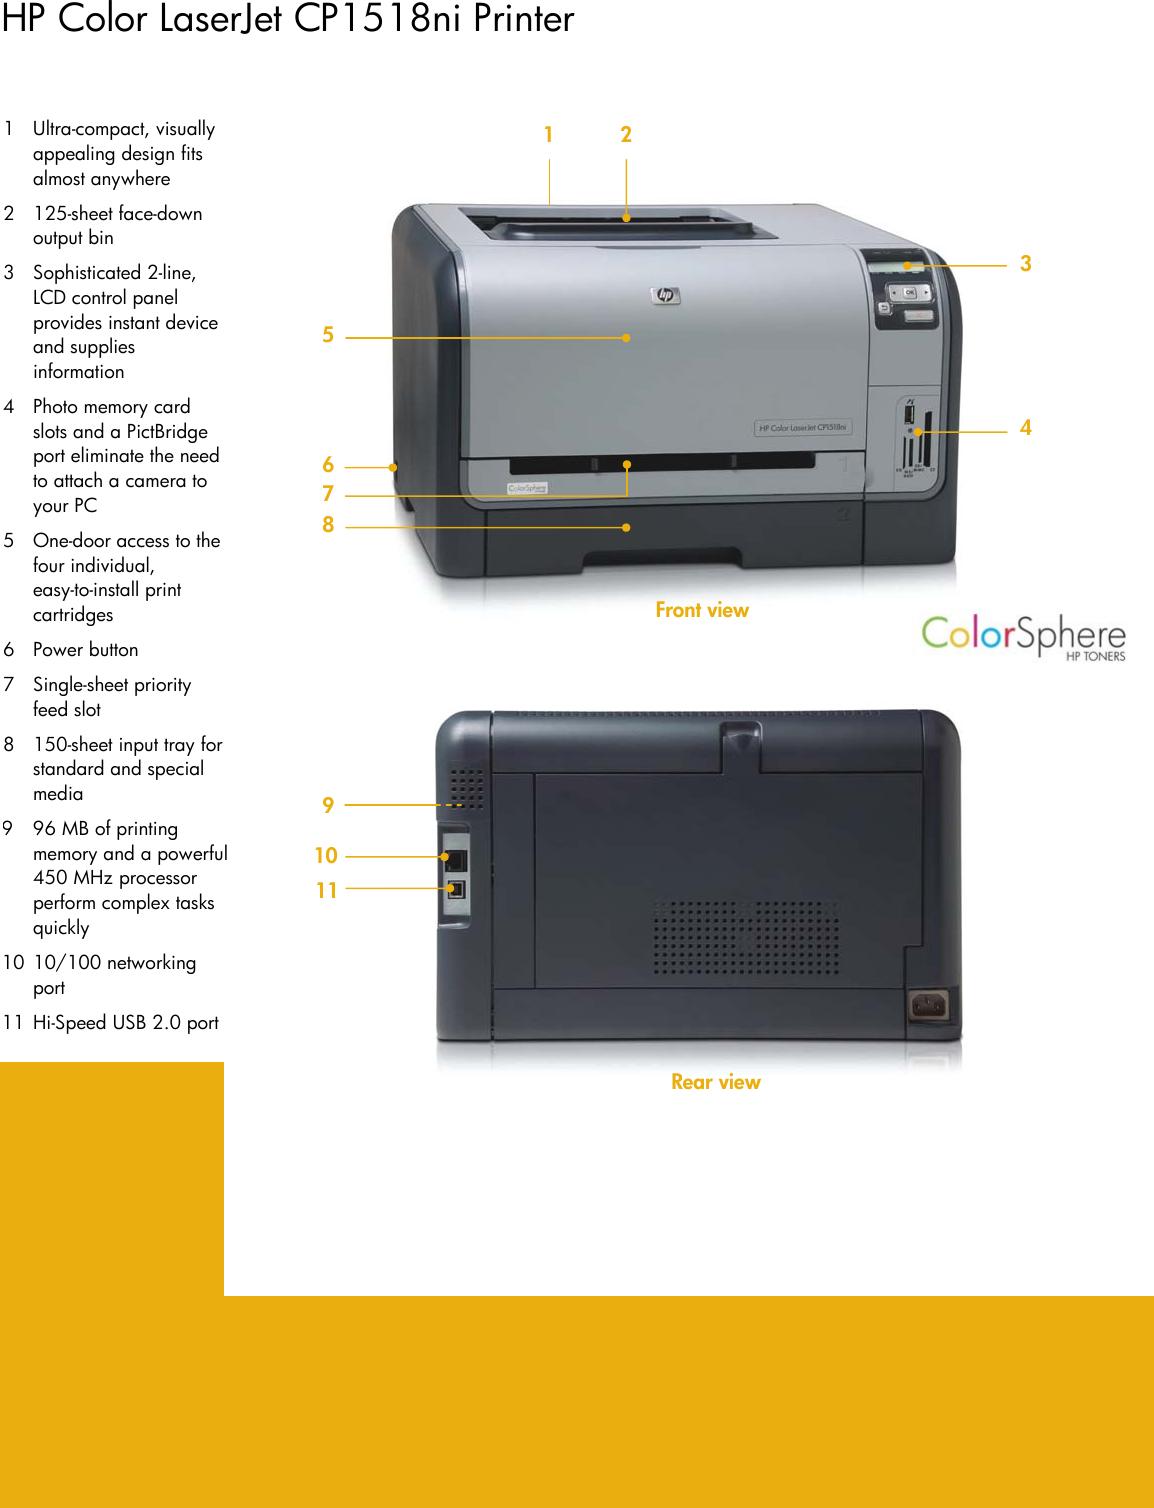 Page 2 of 4 - Hp Hp-Laserjet-Cp1518Ni-Users-Manual-